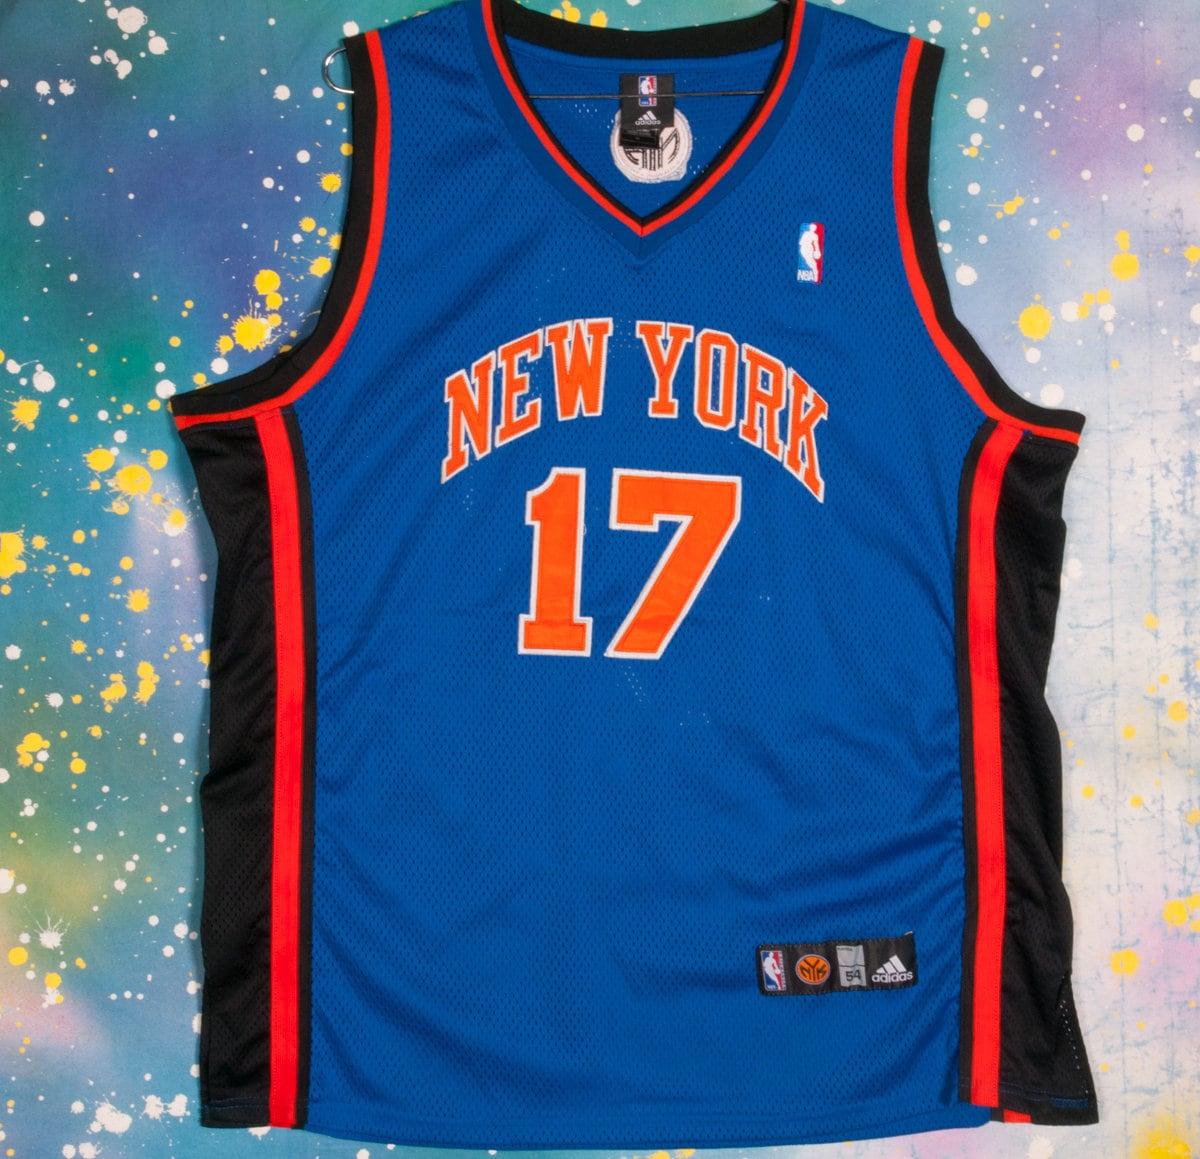 New York NETS #17 Basketball Jersey Size 54